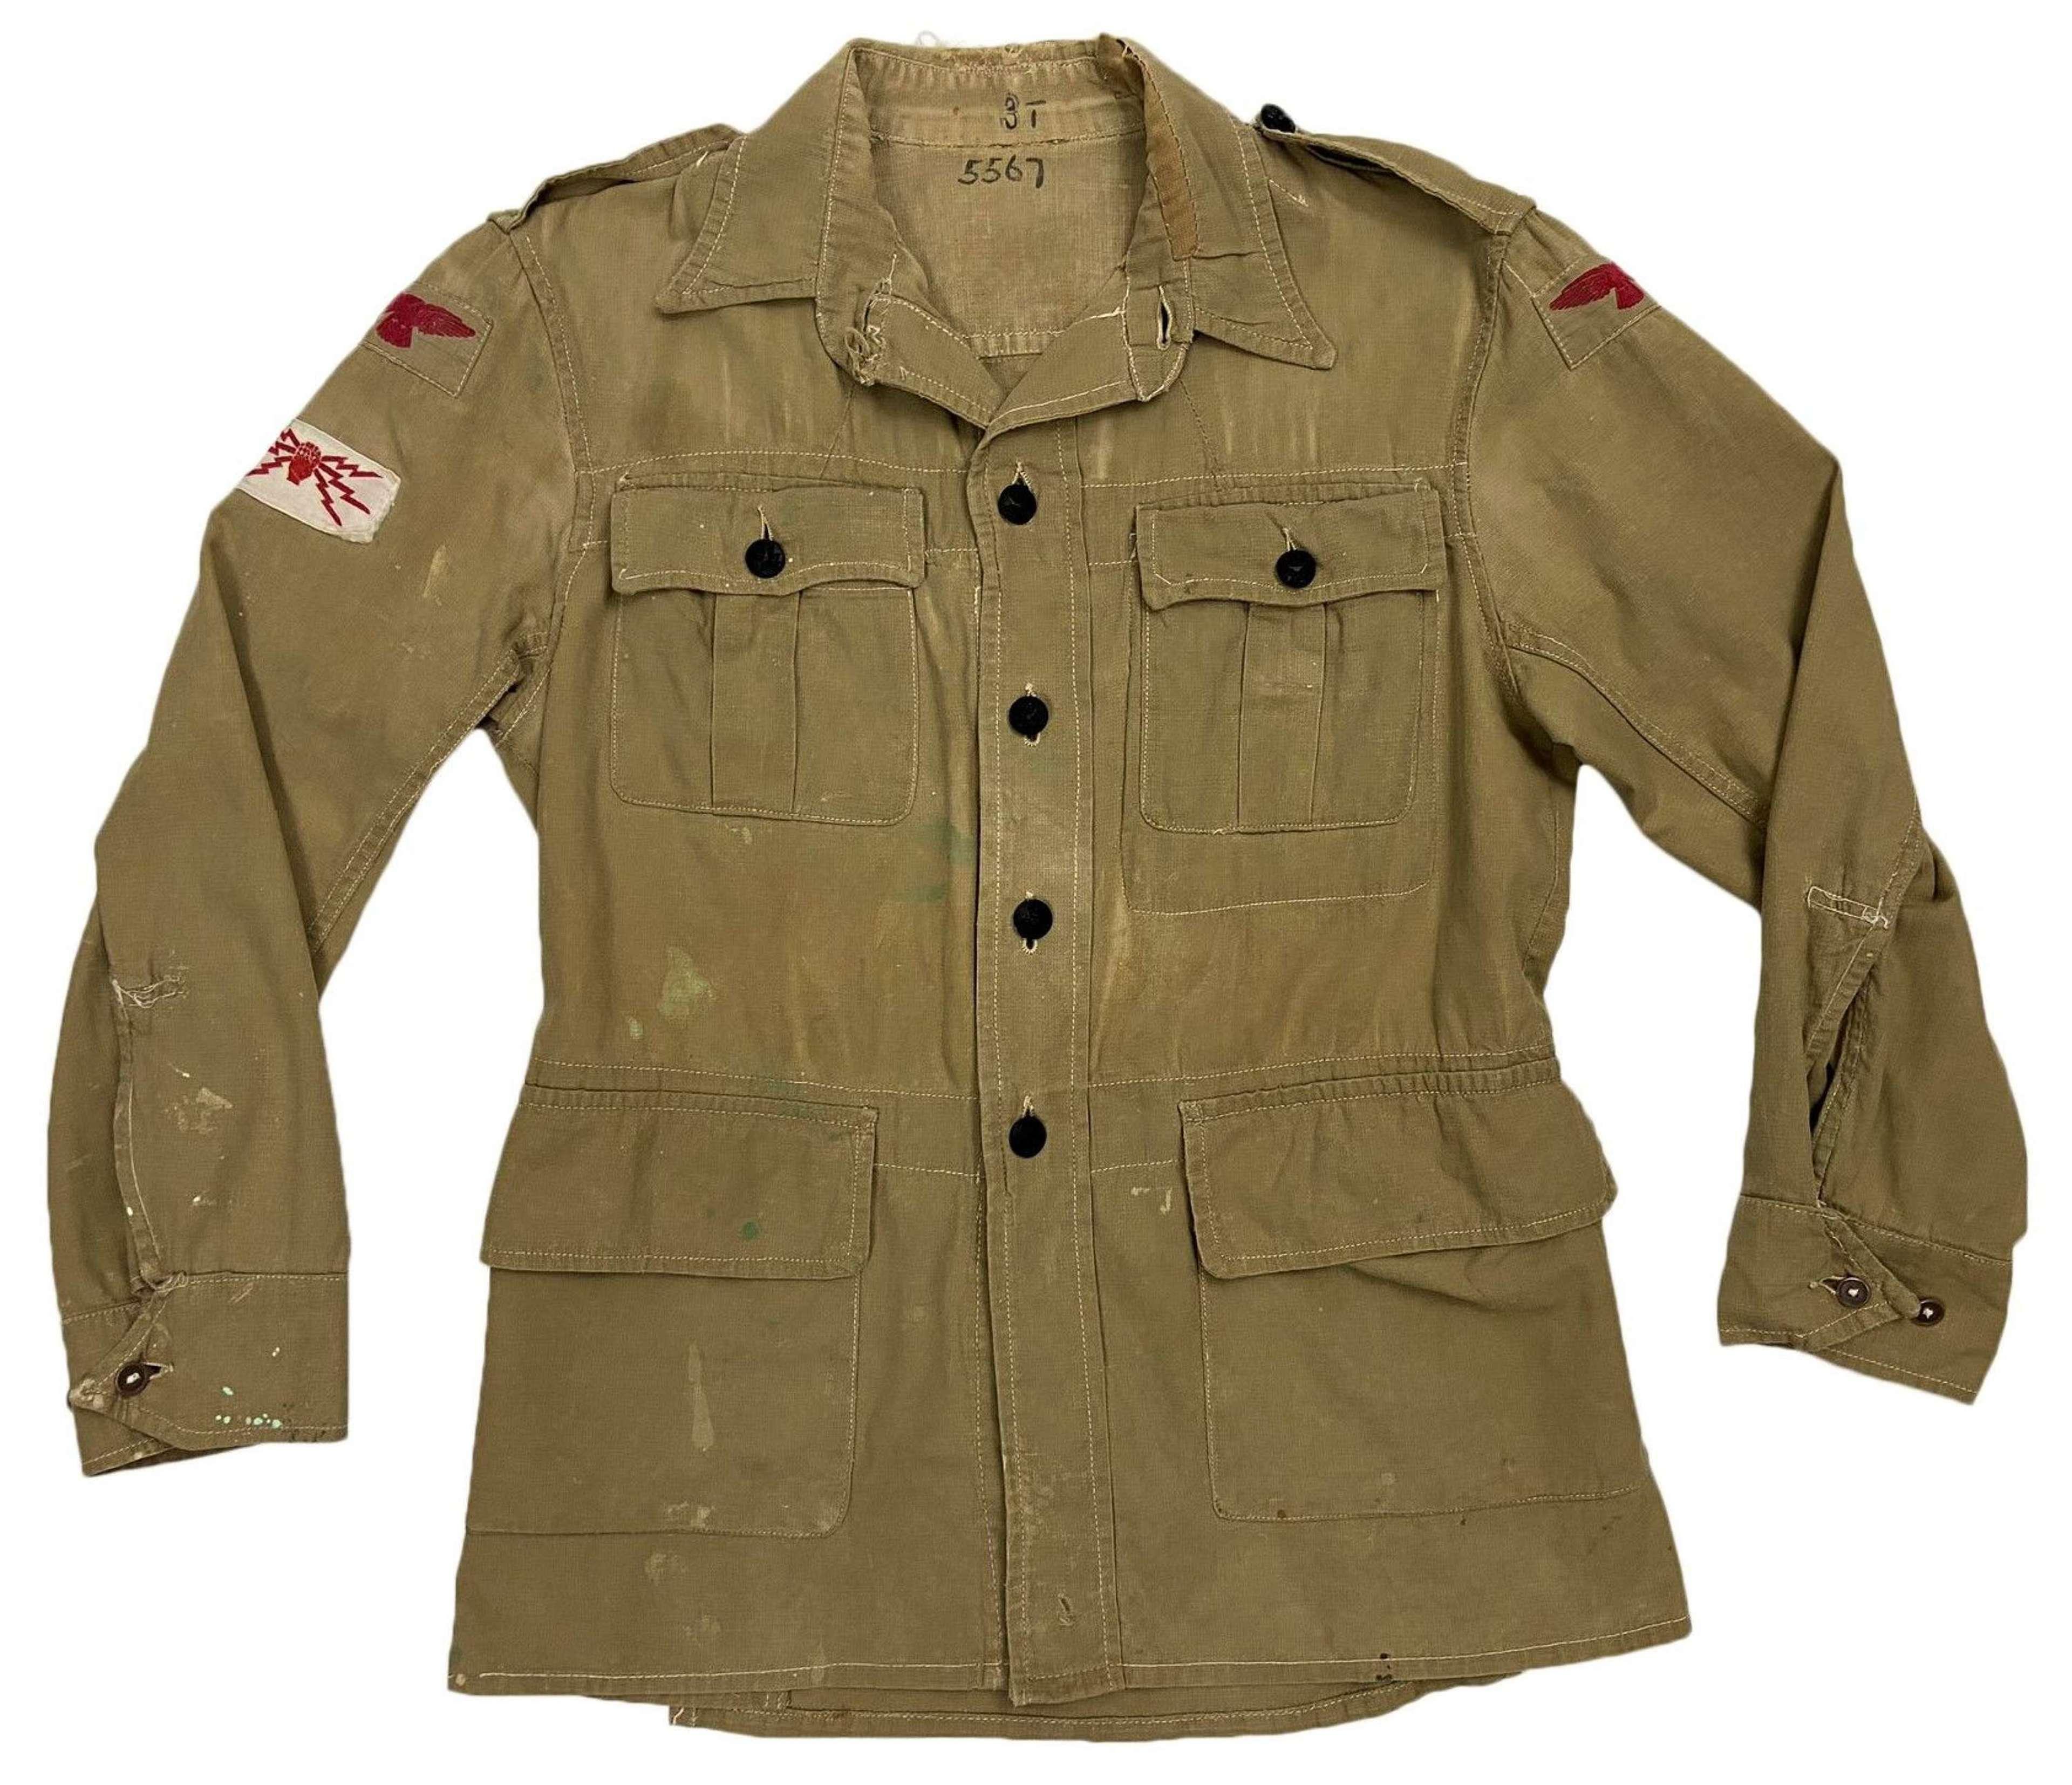 Original 1945 Dated RAF Khaki Drill Bush Jacket - Size 6